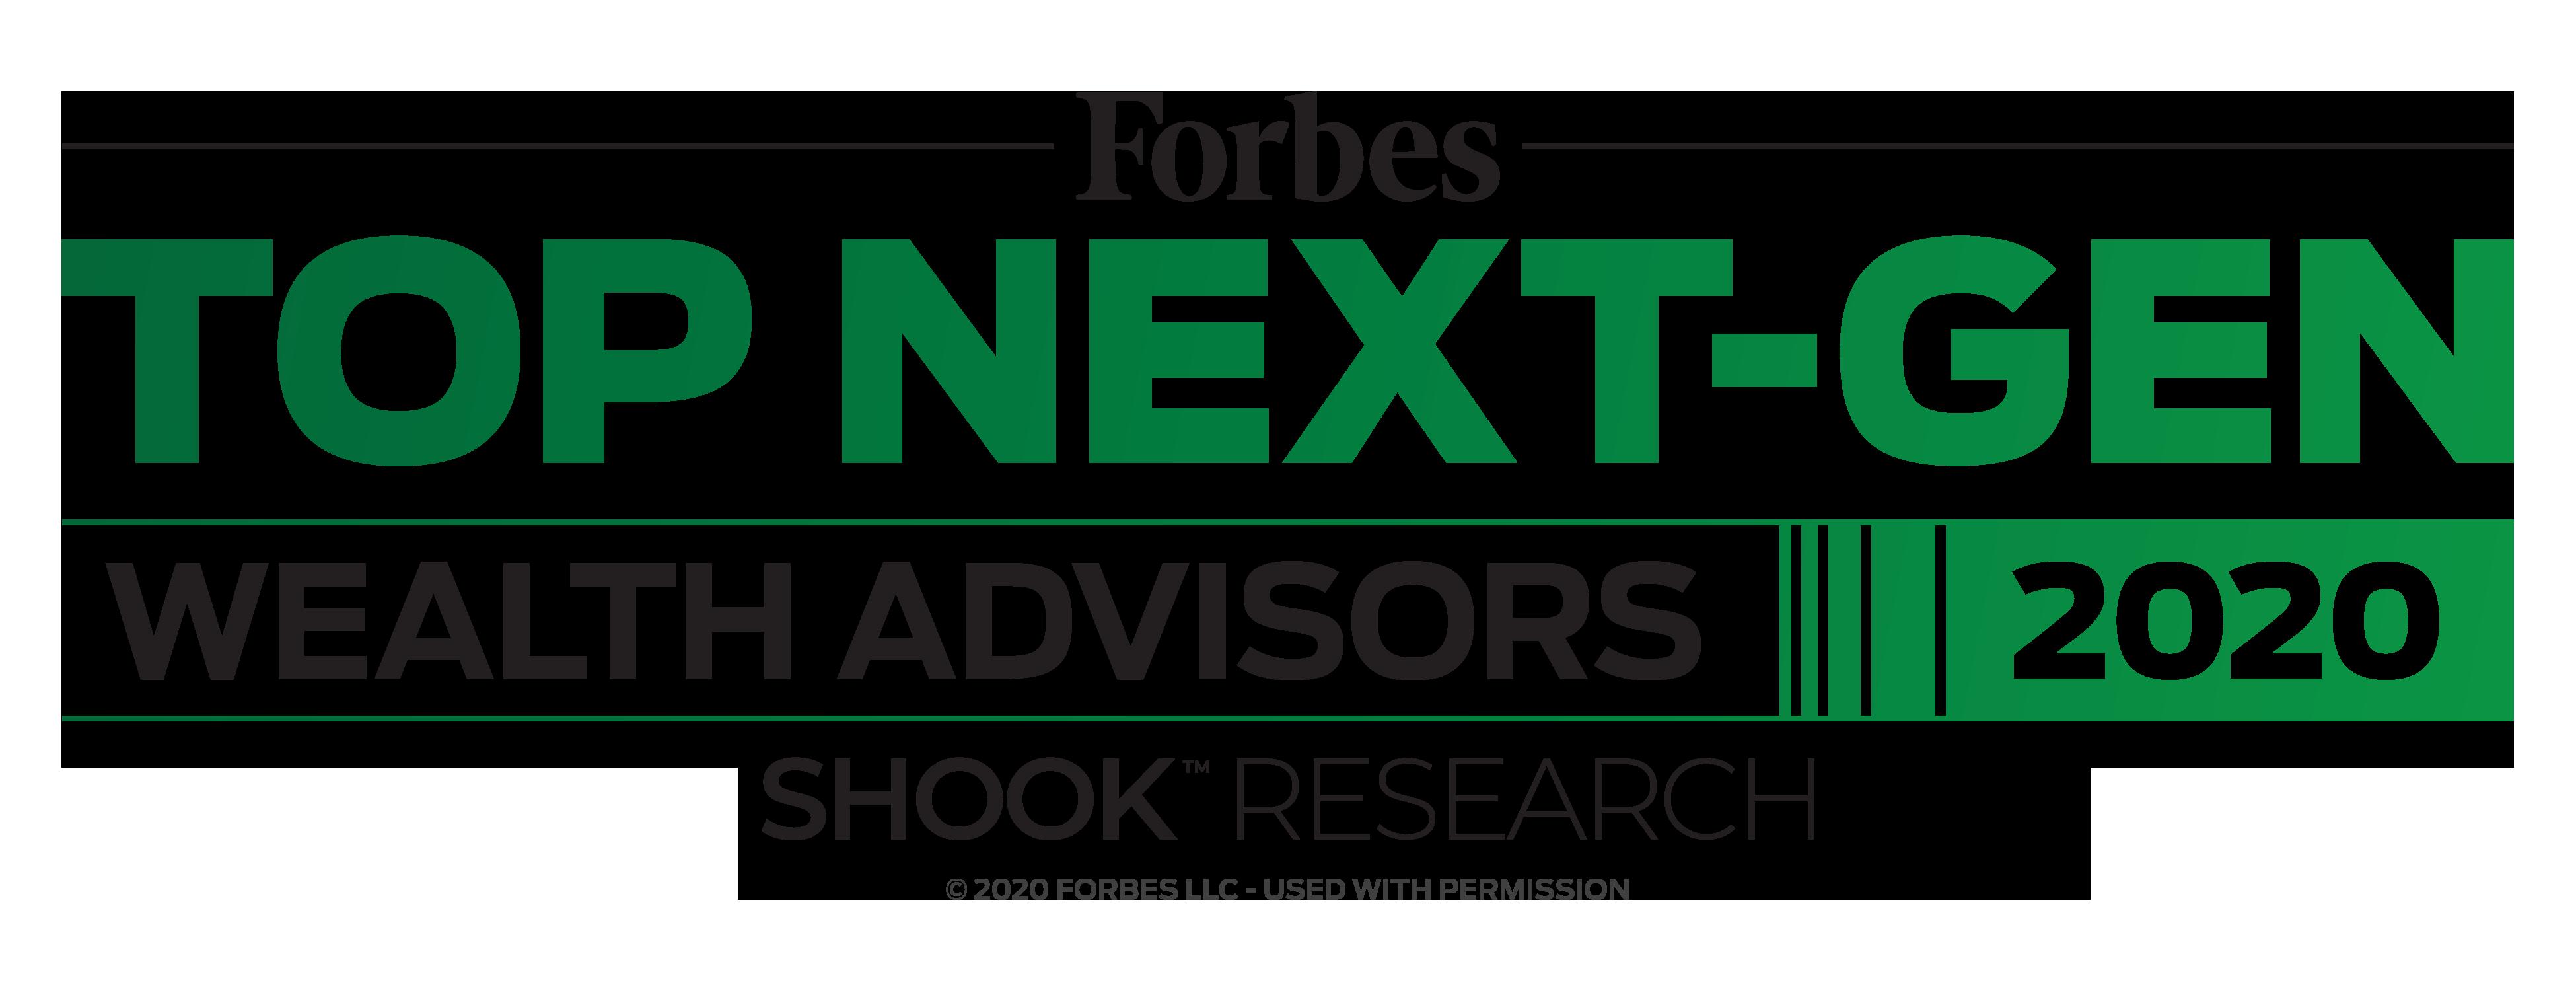 Forbes-SR-2020-Top-Next-Gen-Wealth-Advisors